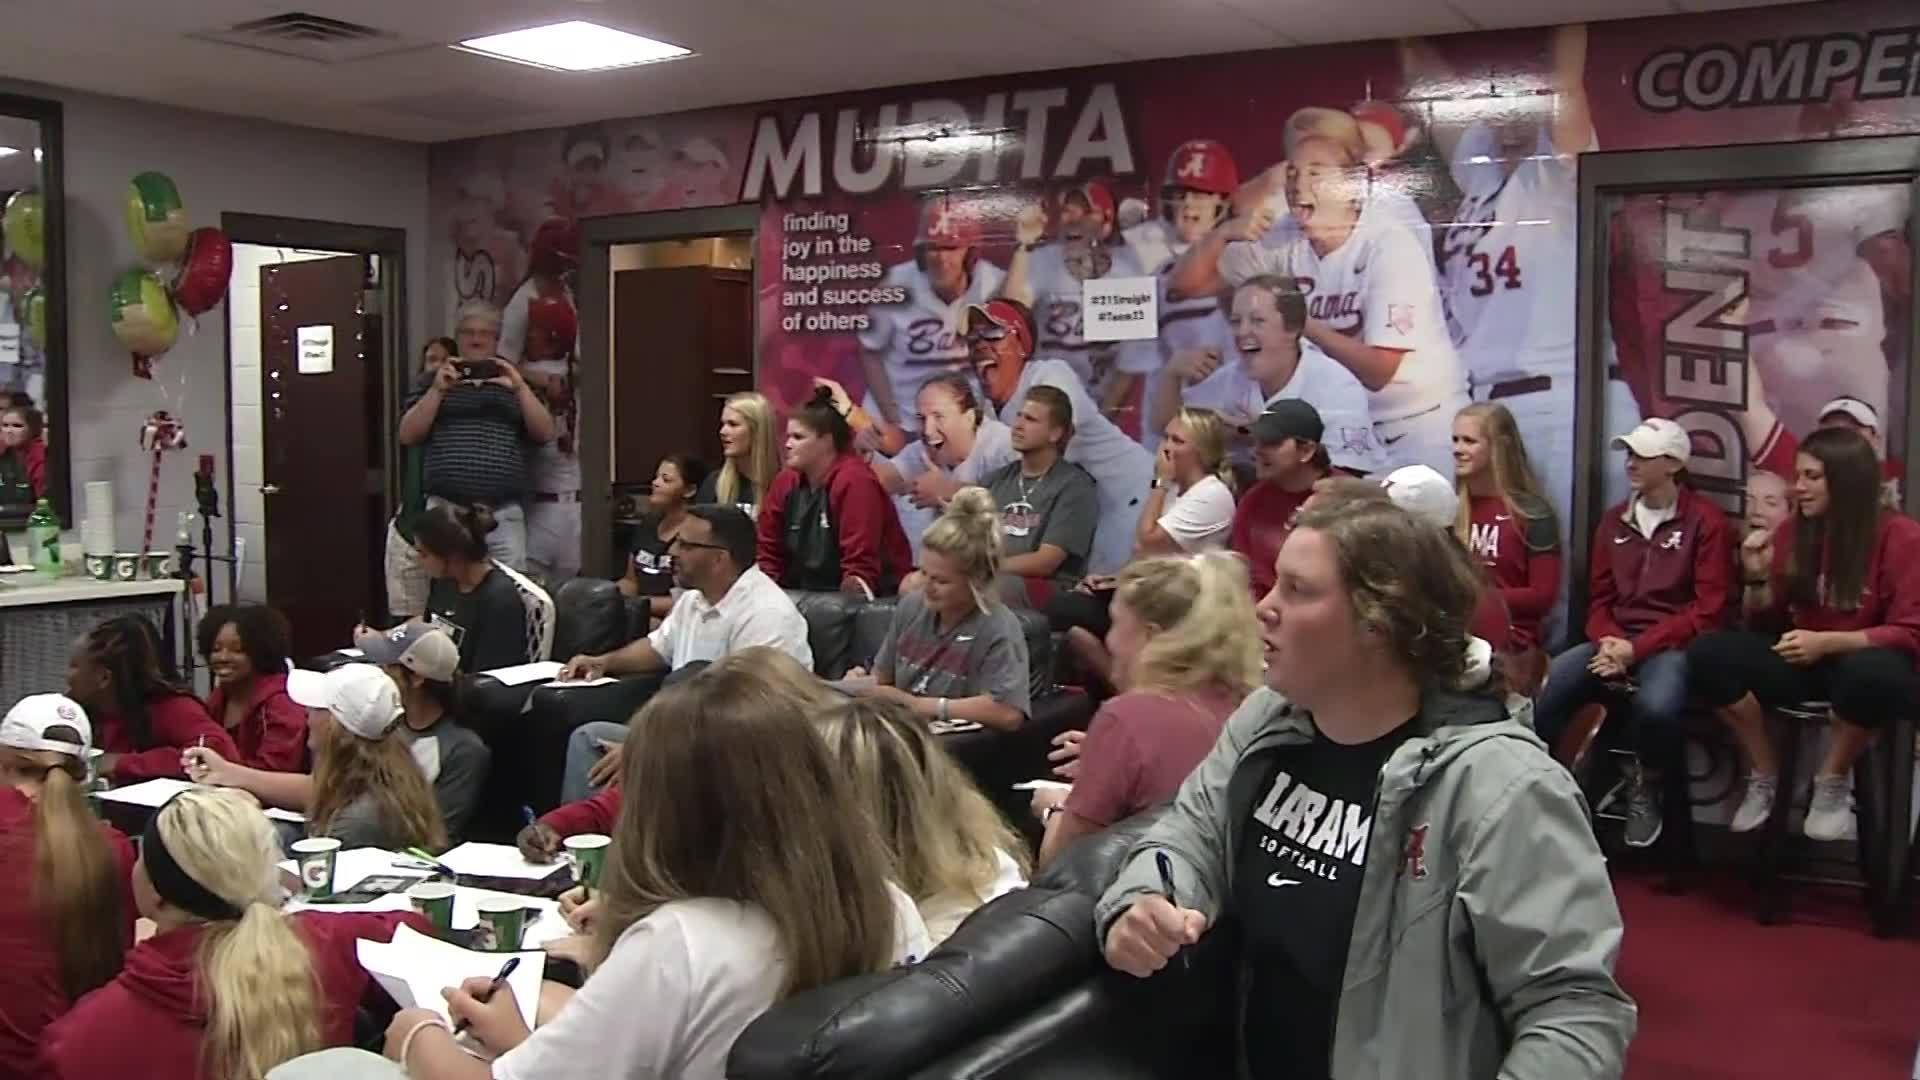 Alabama_softball_watch_party_6_20190513032404